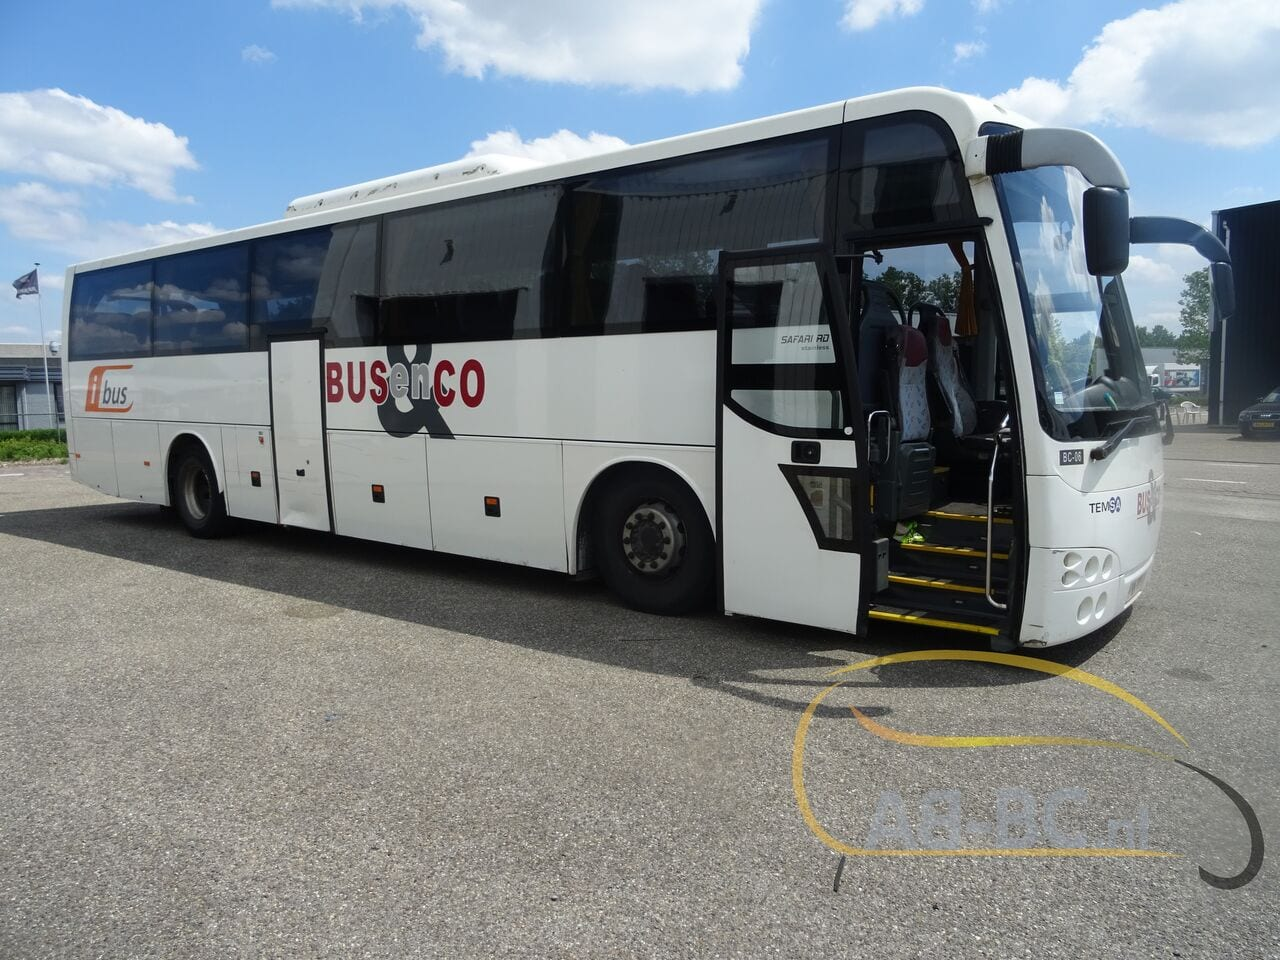 coach-busTEMSA-Safari-RD-DAF-Motor-53-Seats-Euro-5---1623932771360606498_big_0ef021a04d4452600a9665cafaa47408--21061715155620919600